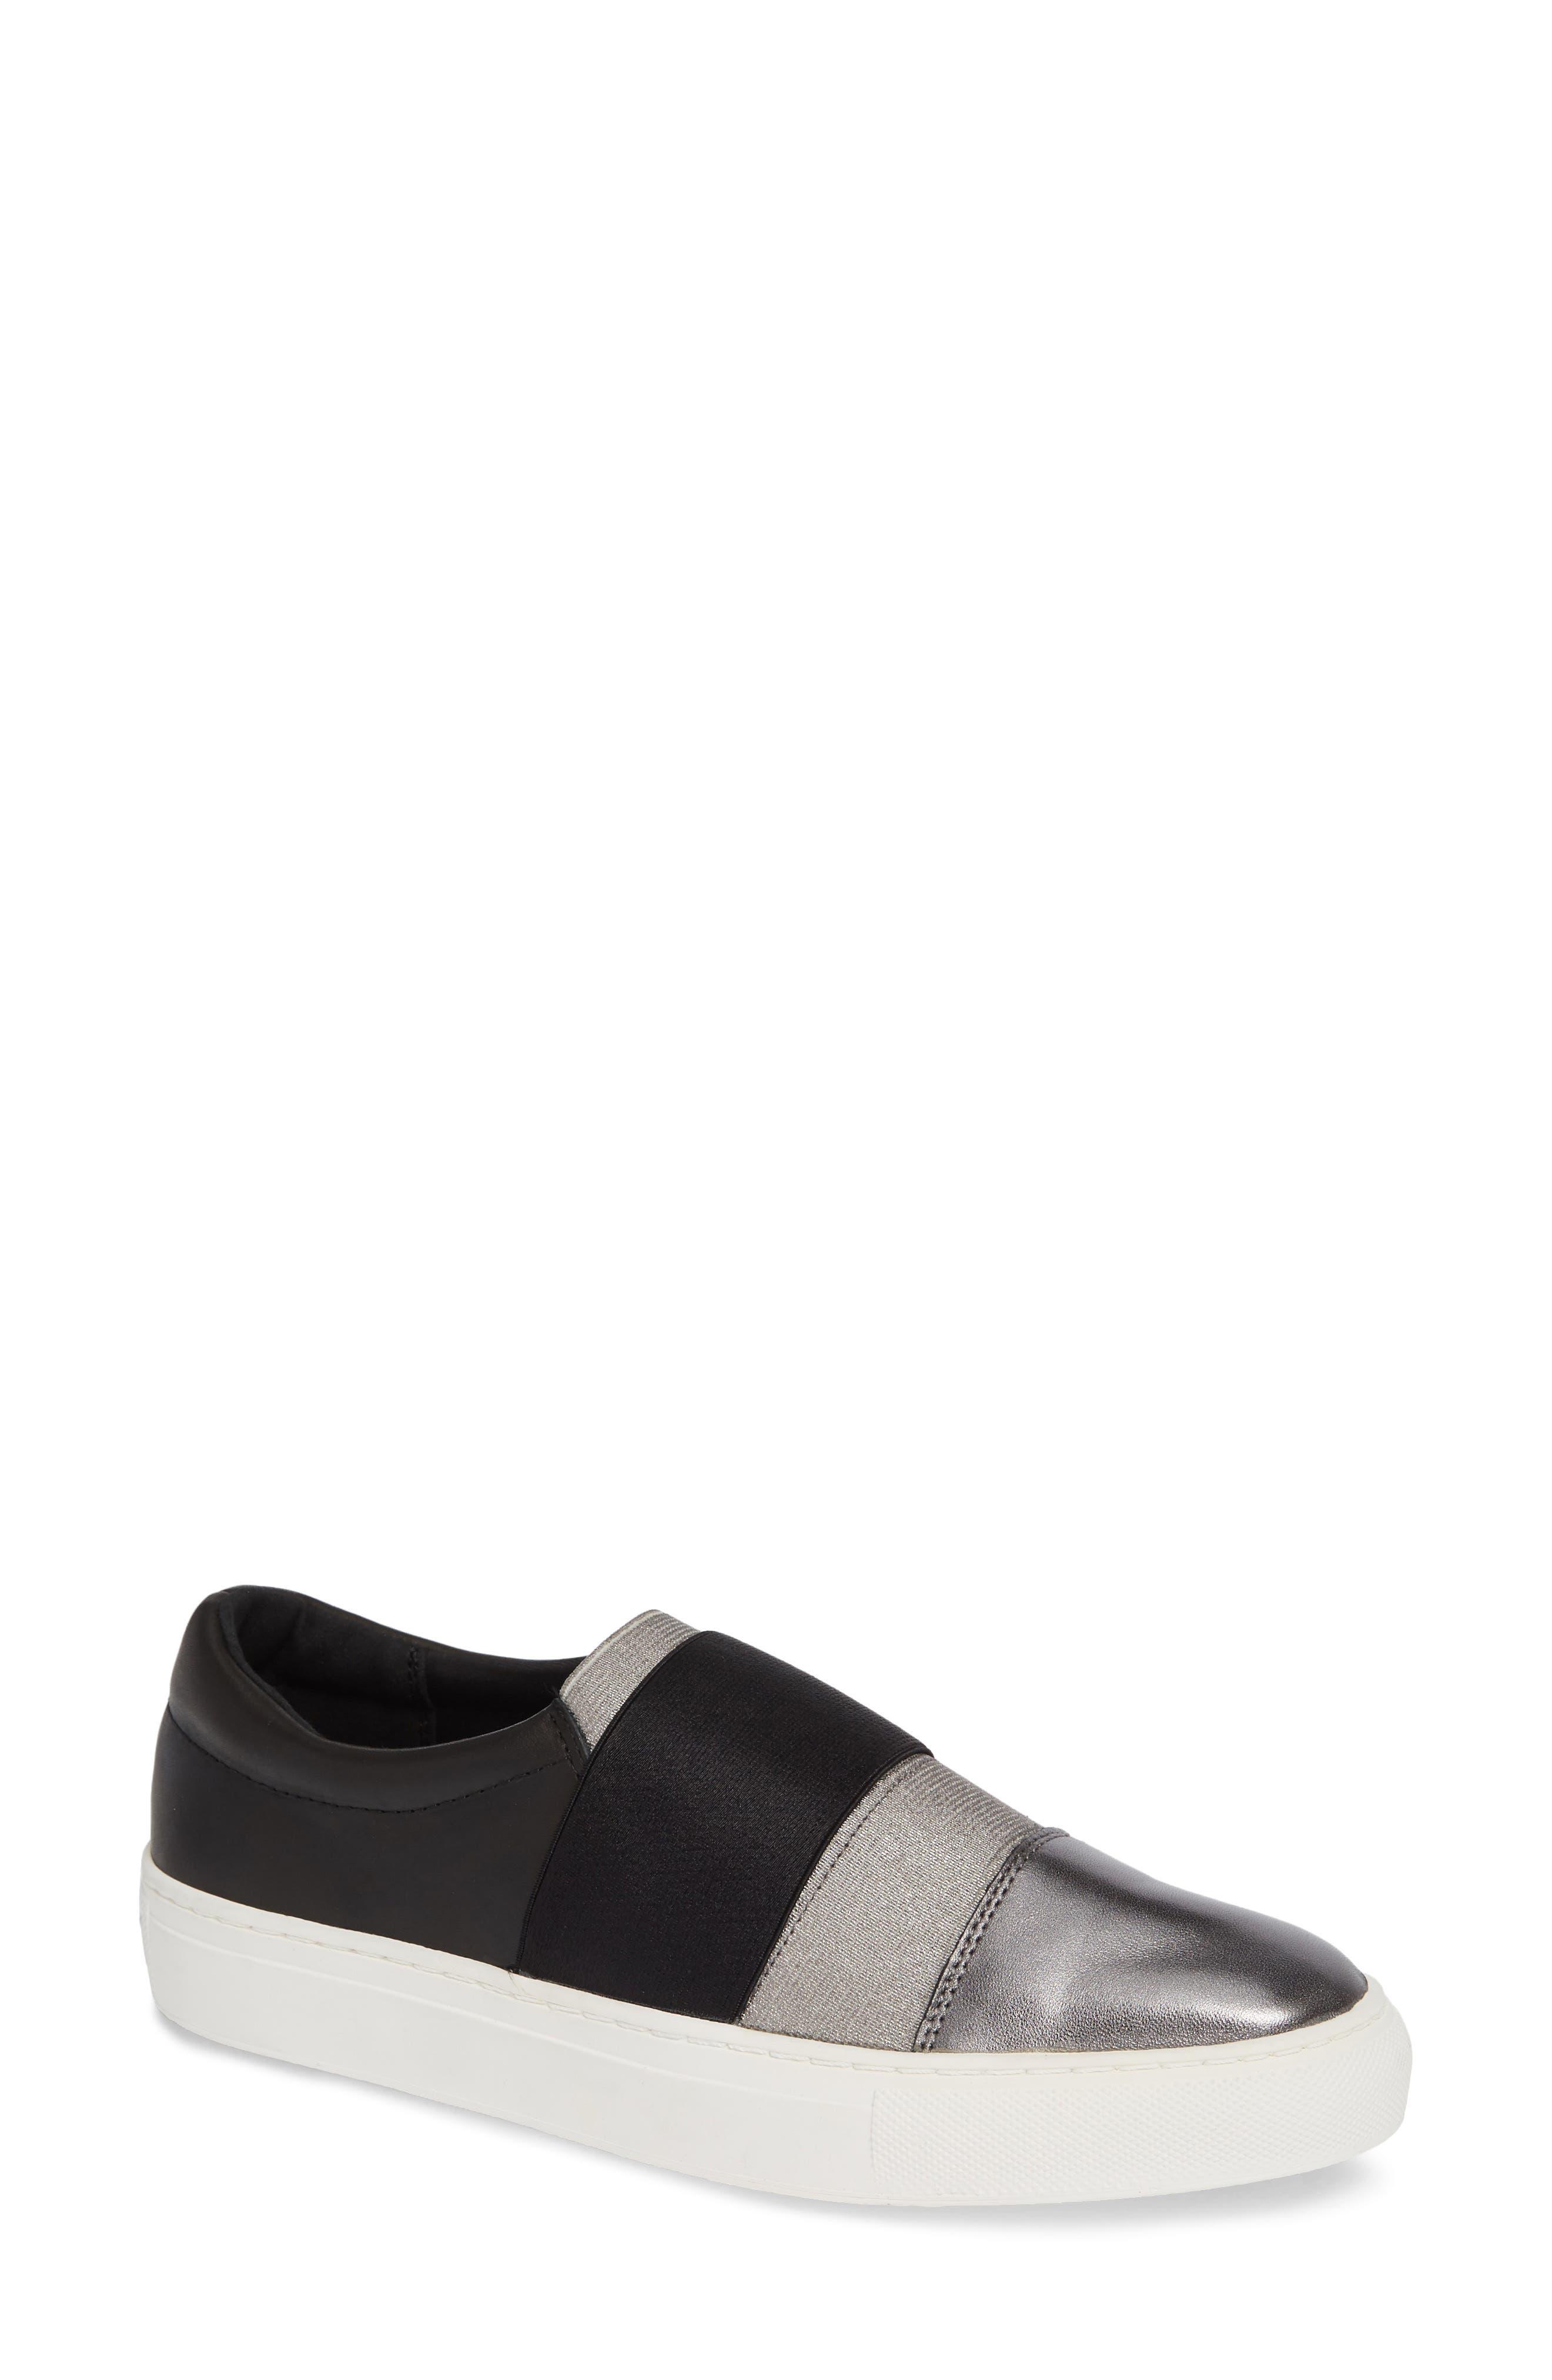 Isla Slip-On Sneaker,                         Main,                         color, GUNMETAL/ BLACK LEATHER